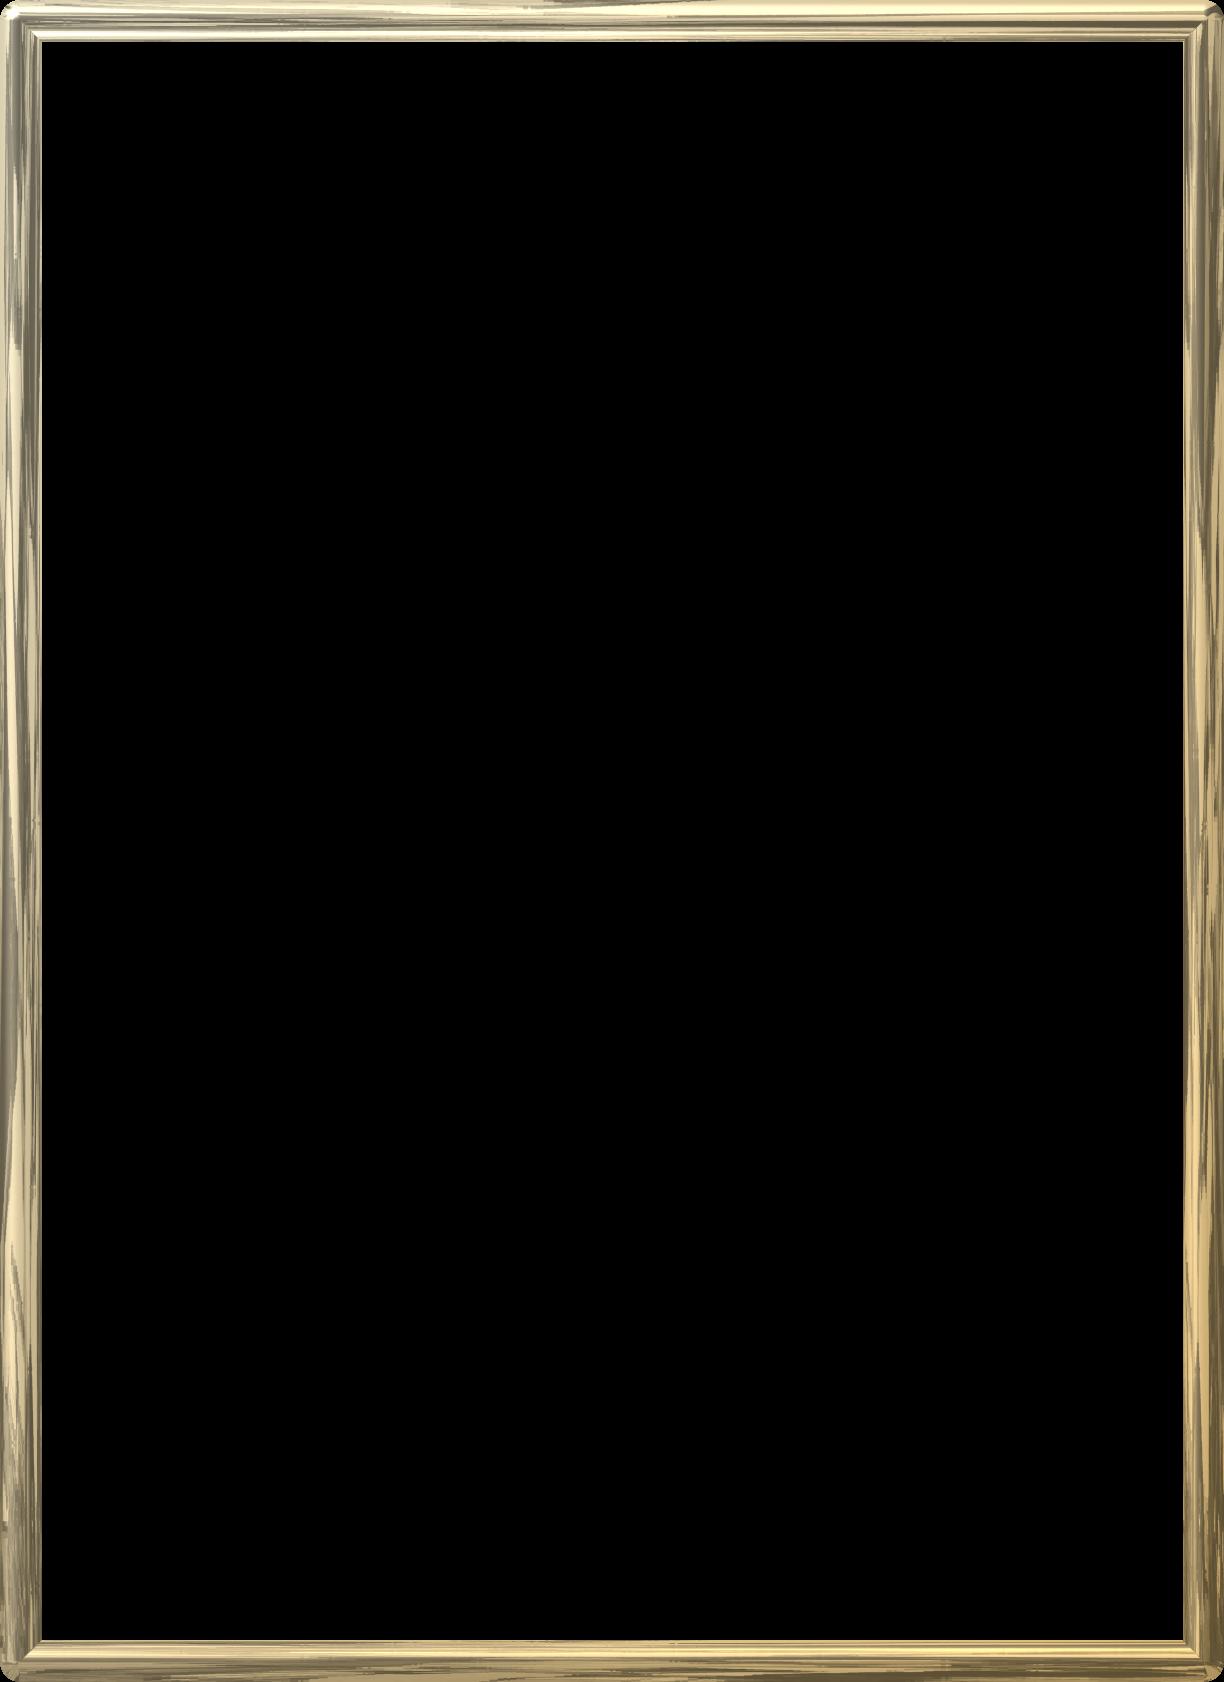 clipart royalty free stock Borders clipart plain. Gold frame border wooden